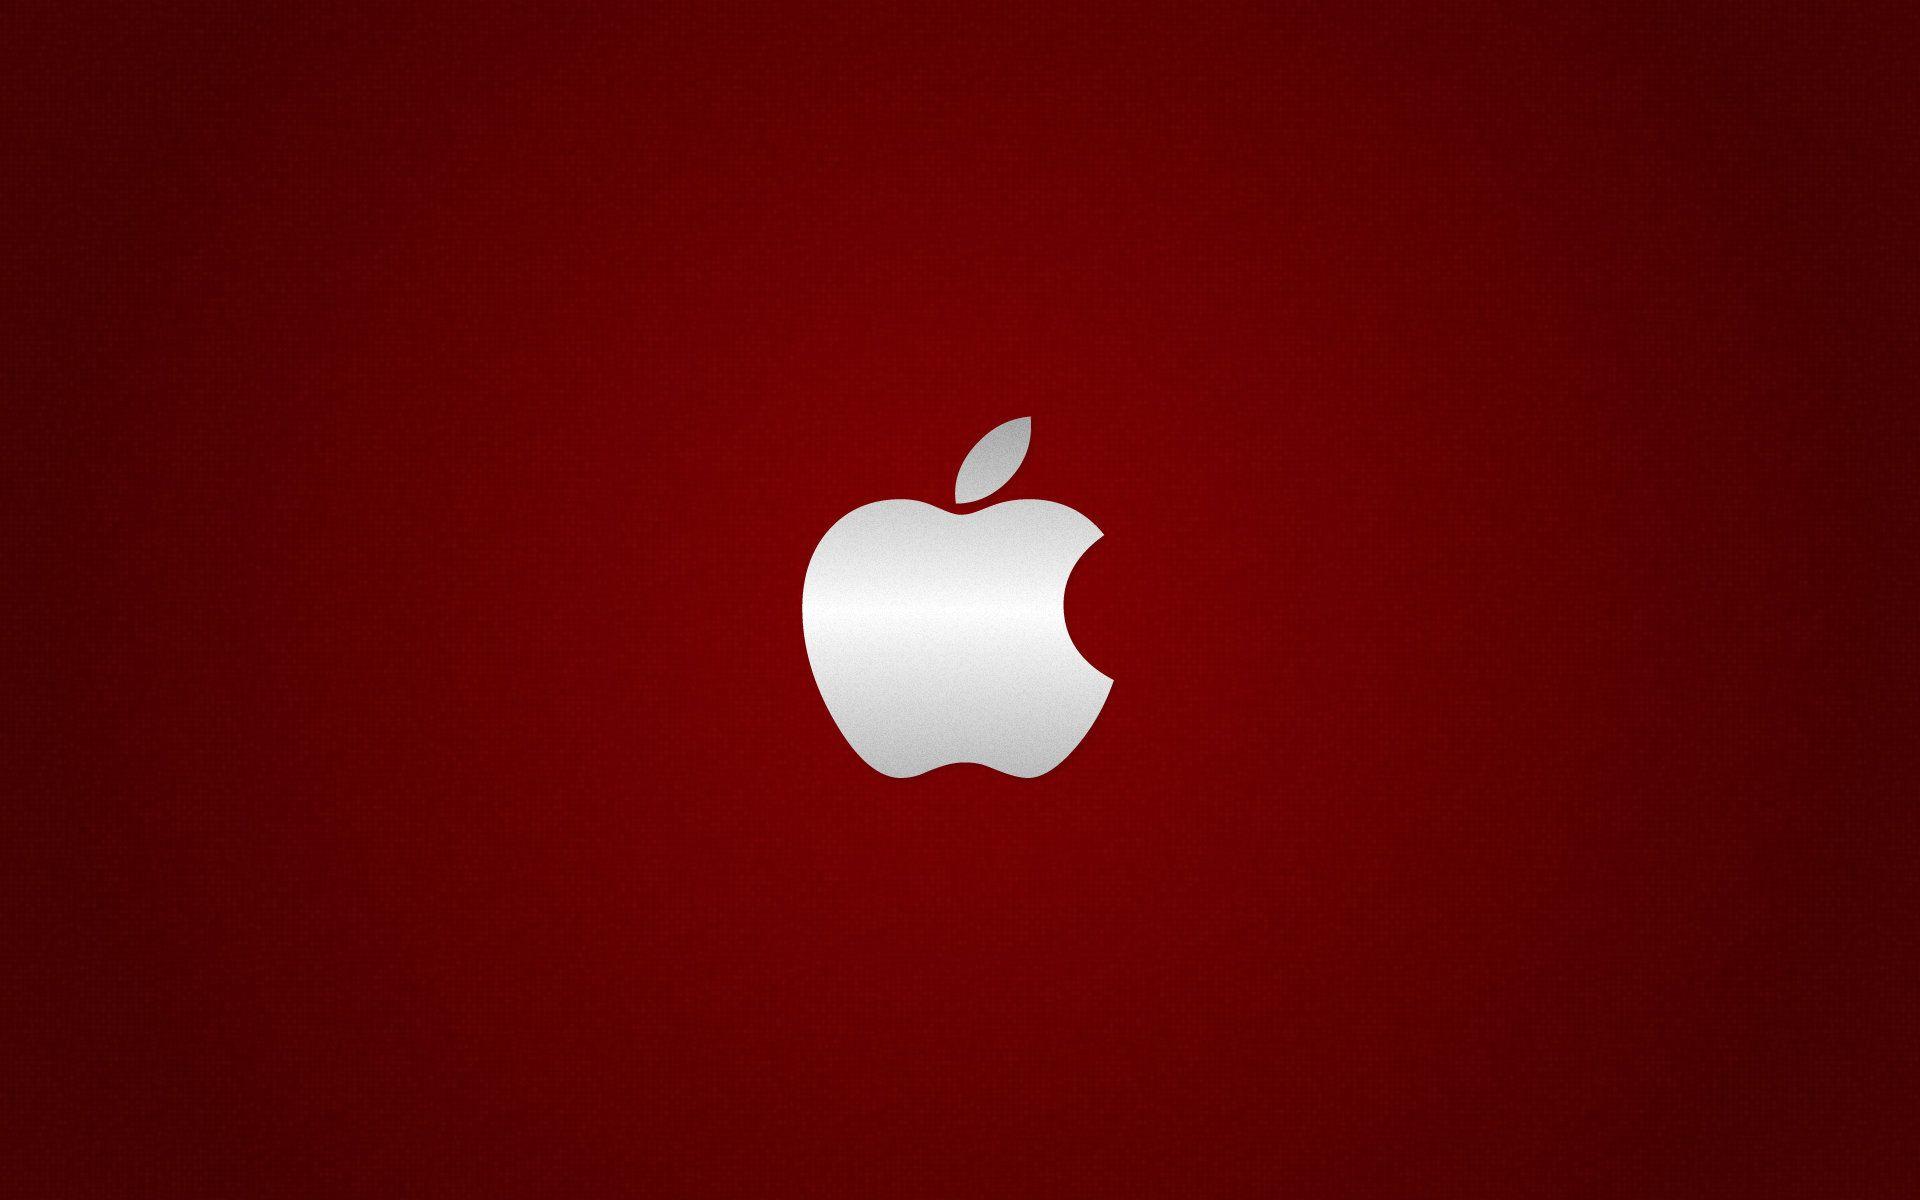 Apple On The Red Carpet By Shamrock593 Deviantart Com On Deviantart Skull Wallpaper Iphone Apple Wallpaper Apple Pictures